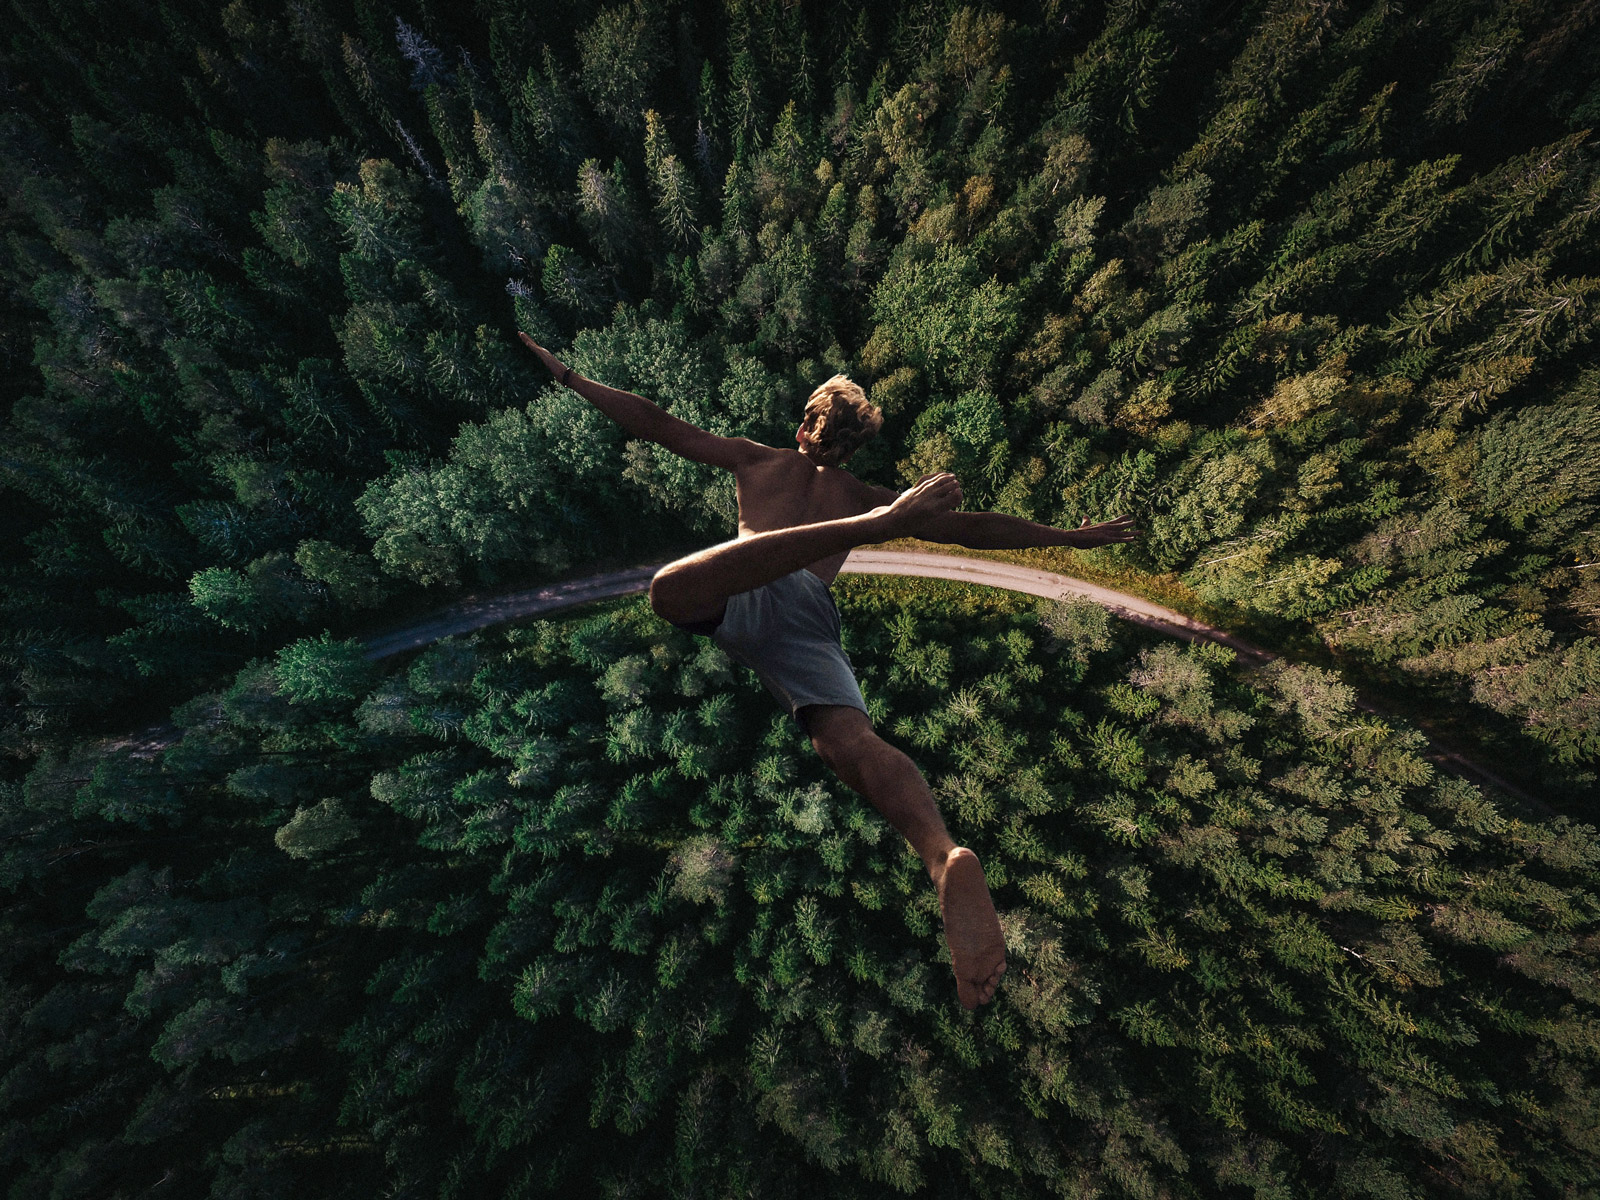 dive into nature